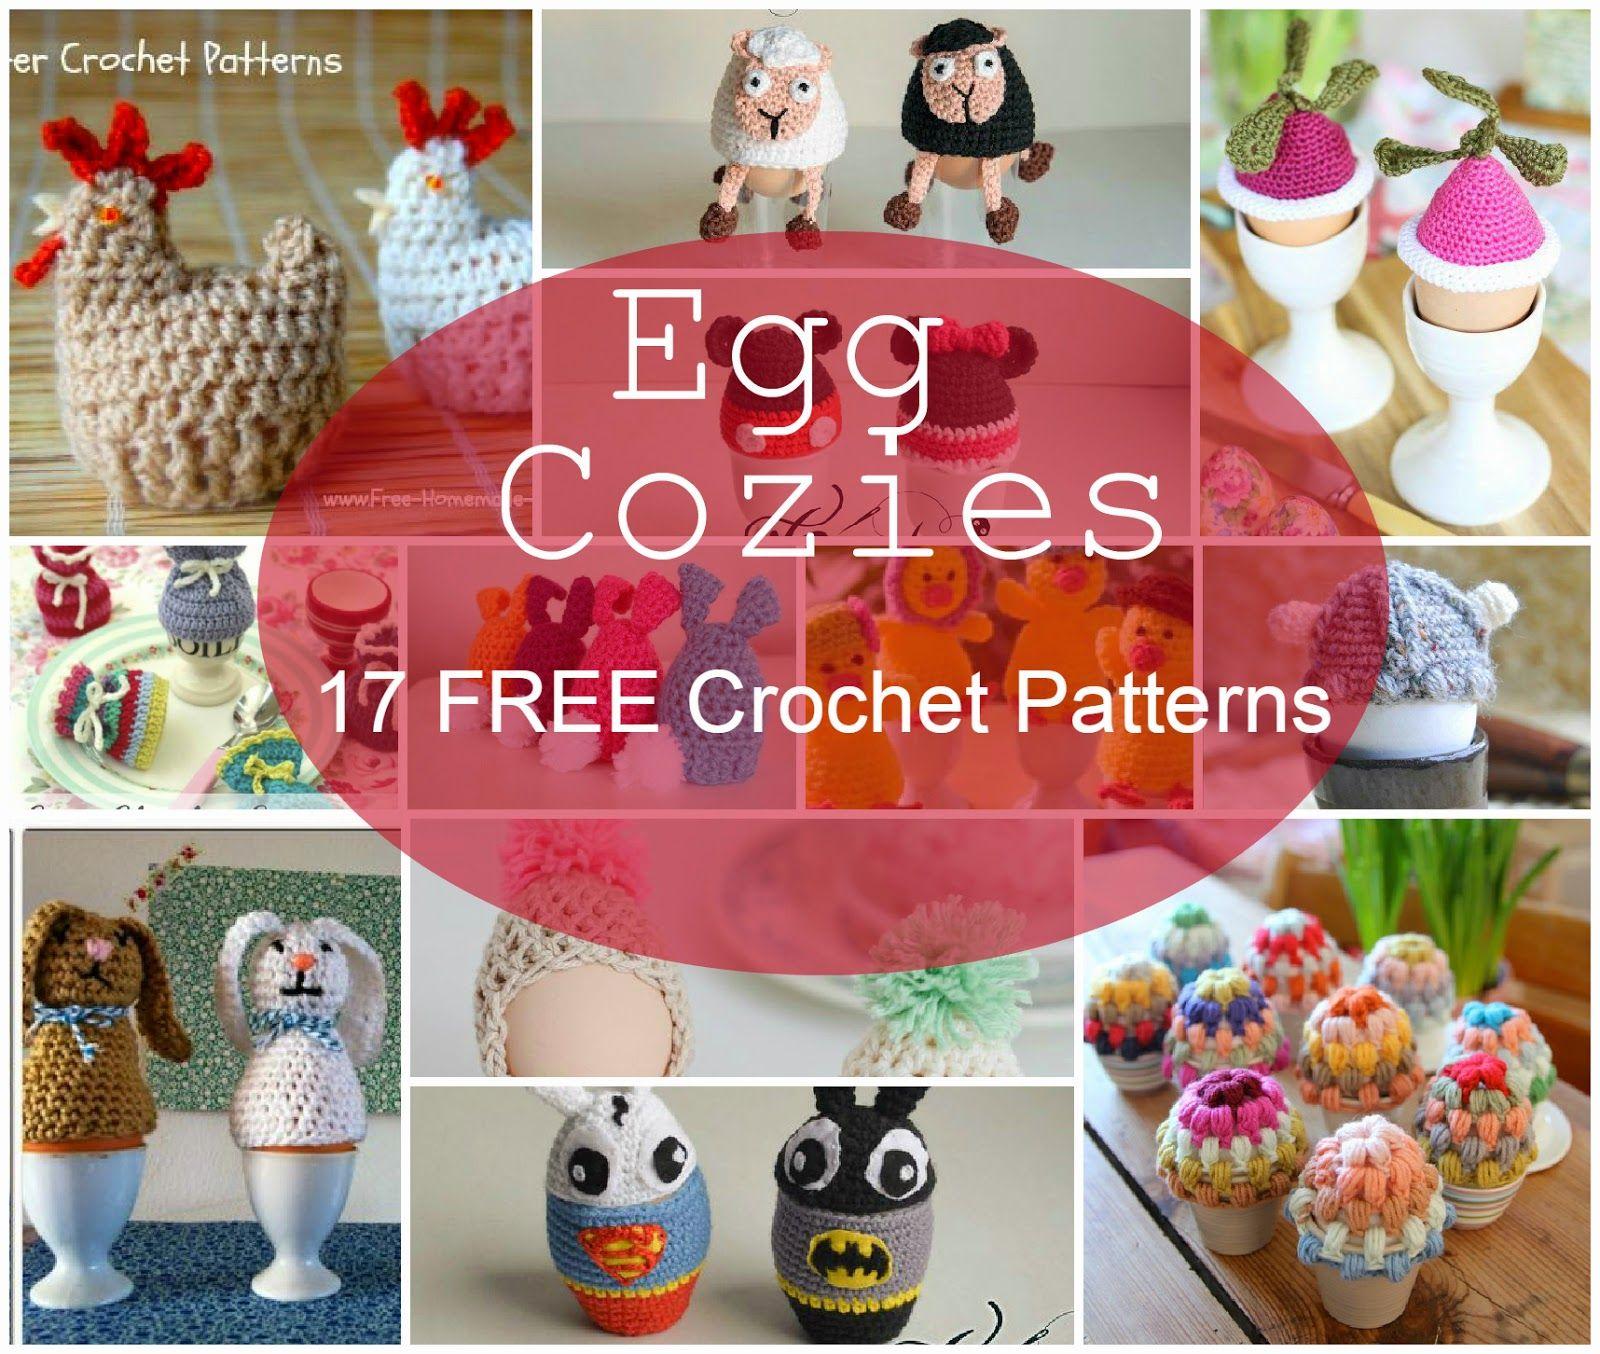 17 free egg cozies crochet patterns crochetholic hilariafina 17 free egg cozies crochet patterns bankloansurffo Gallery